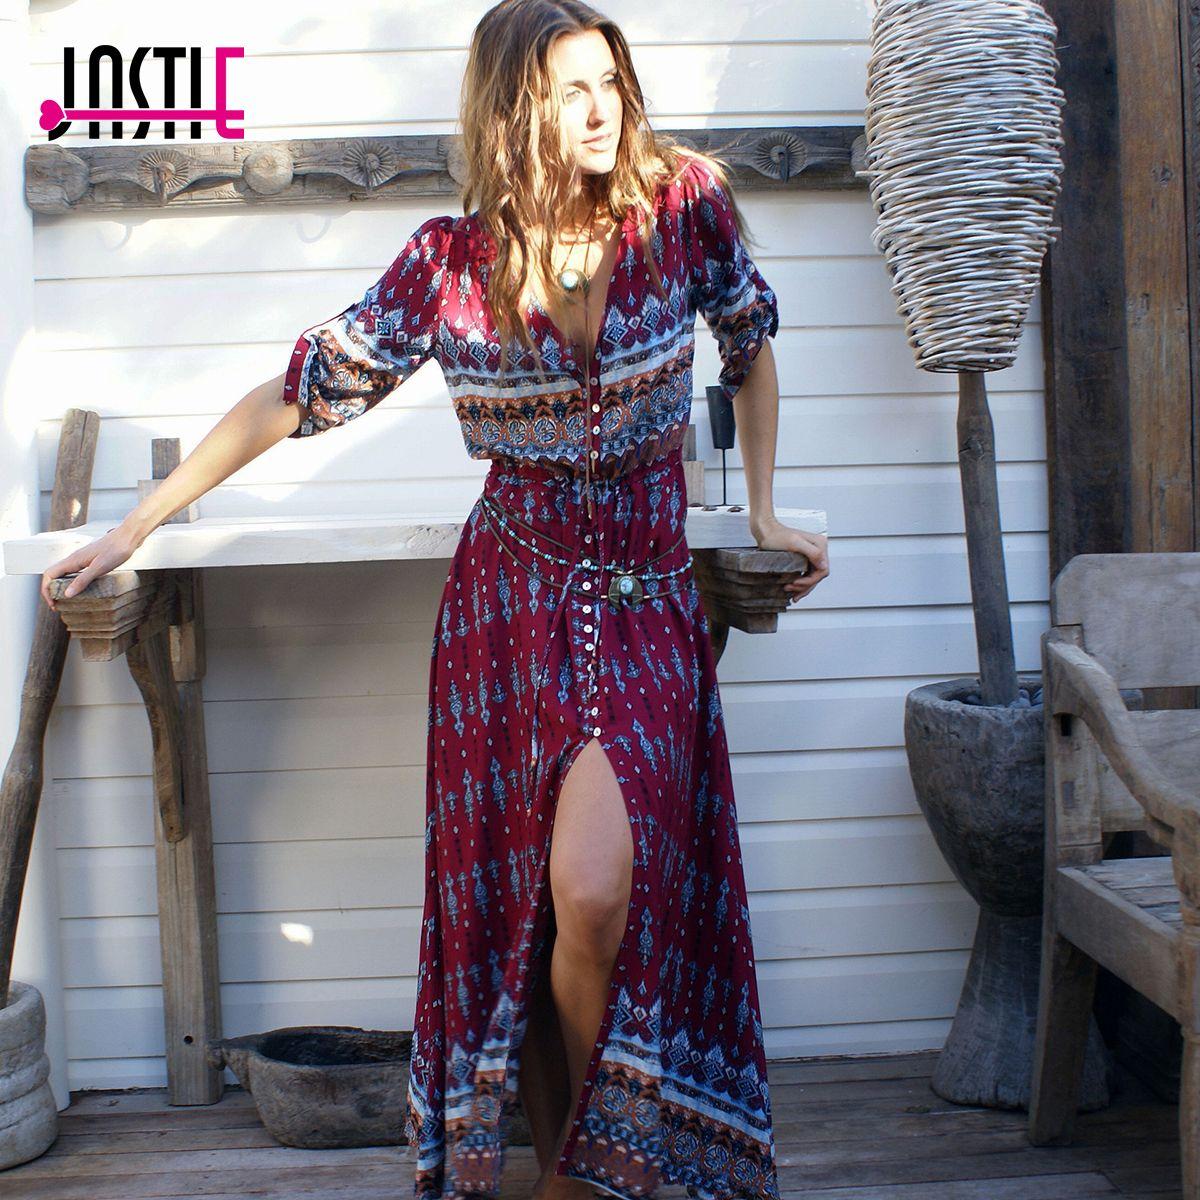 Jastie 3/4 Sleeve A-line Vintage V-Neck Boho Maxi Dress Floral Print Chic Summer Dress 2017 New Plus Size Fashion Women Vestidos